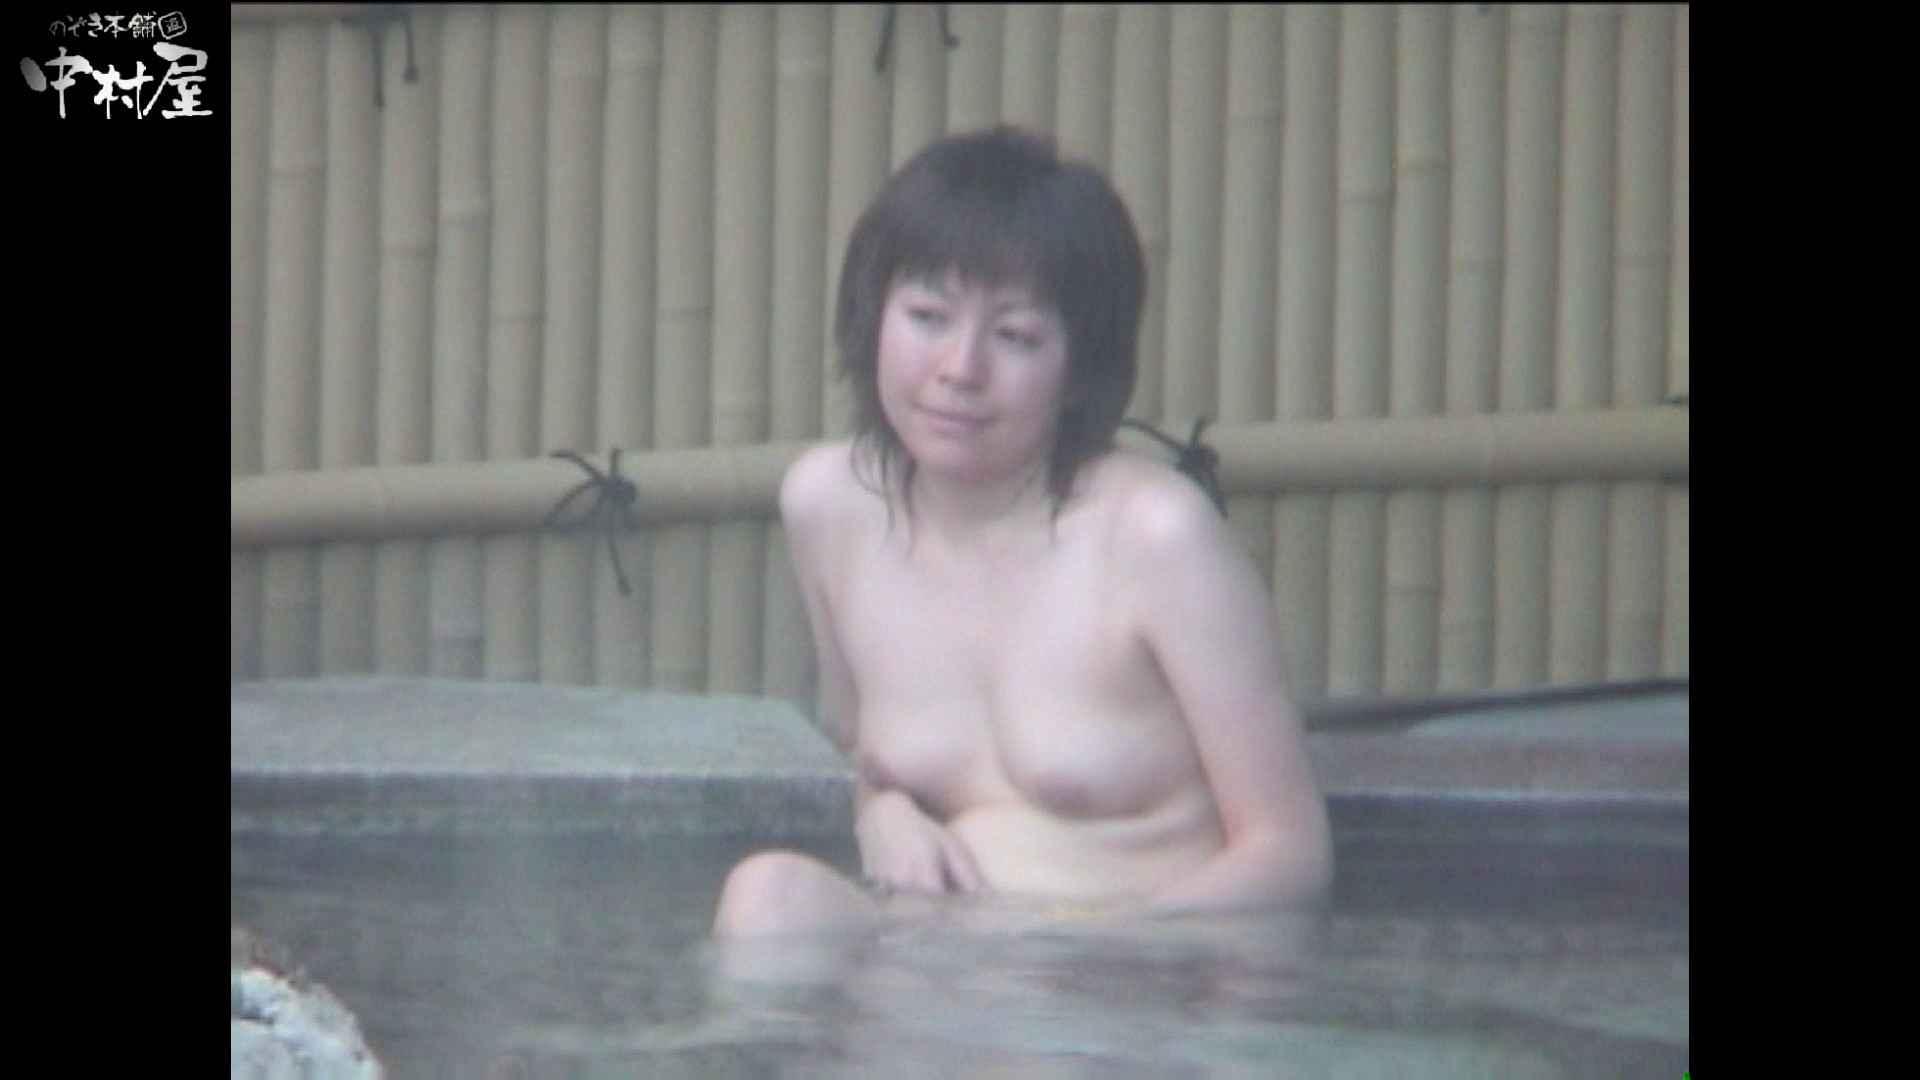 Aquaな露天風呂Vol.985 OLセックス  50画像 9